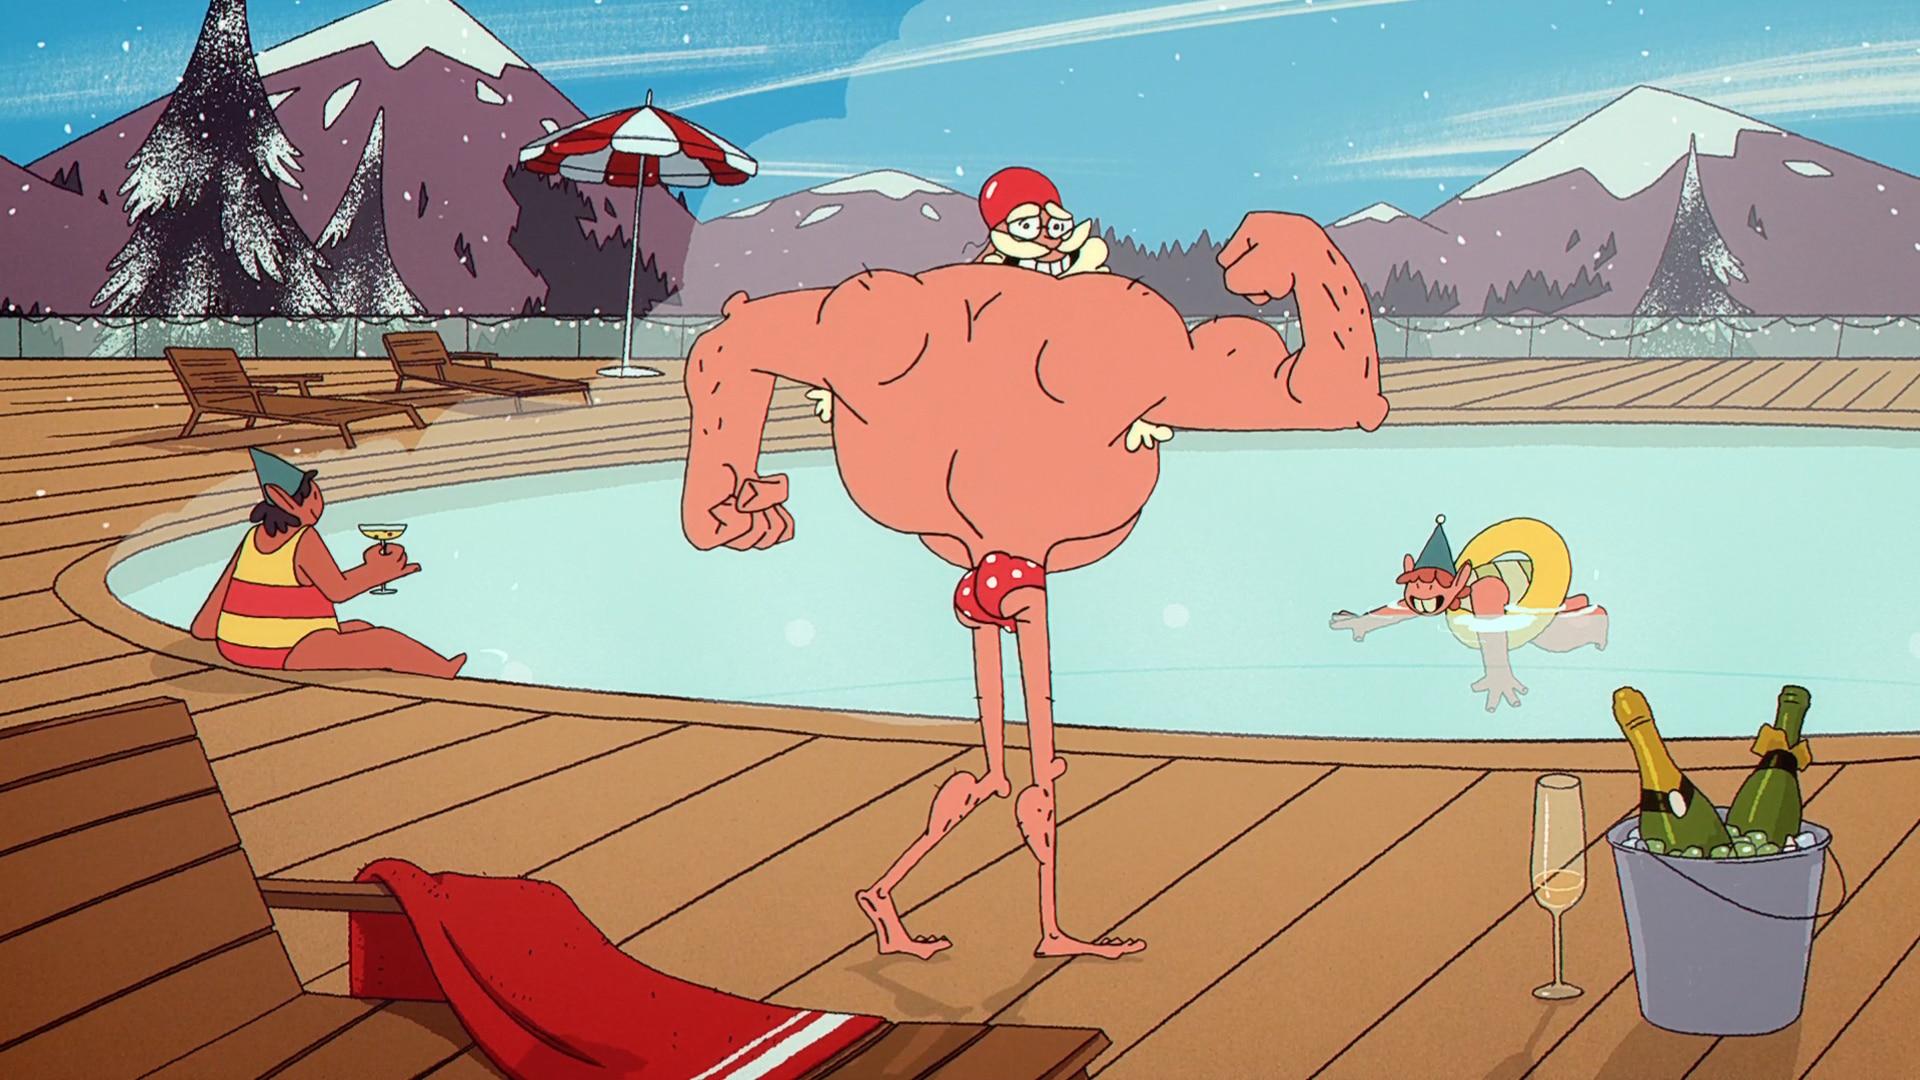 God Jul Animation